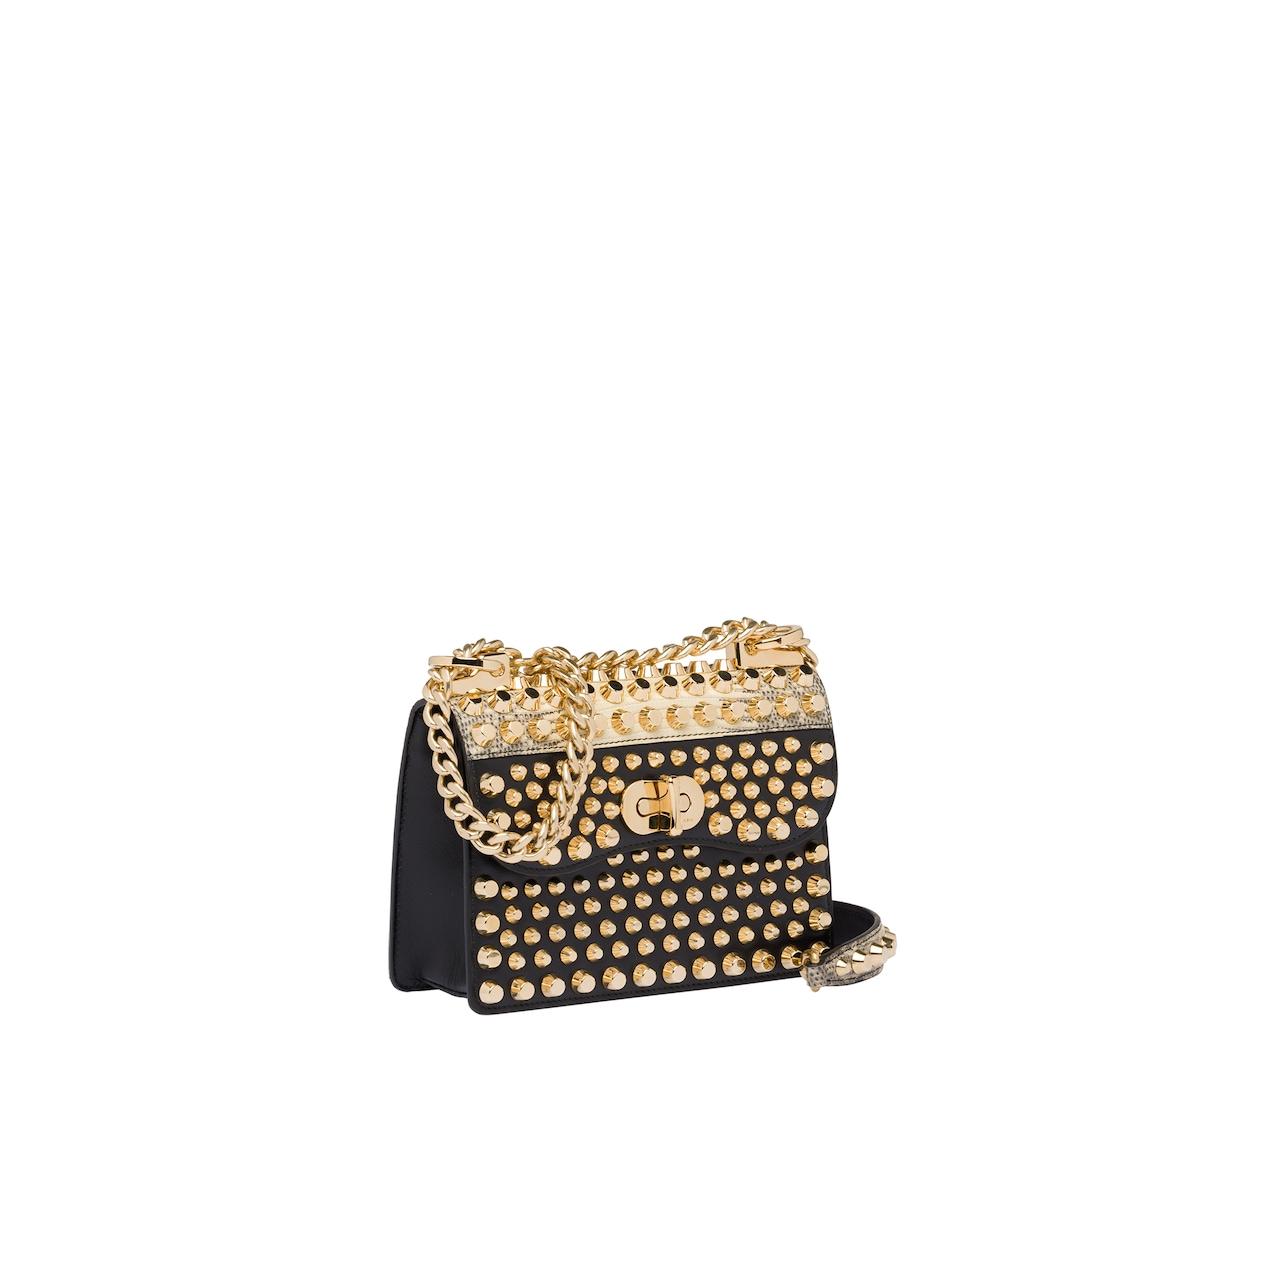 Prada Belle studded leather bag